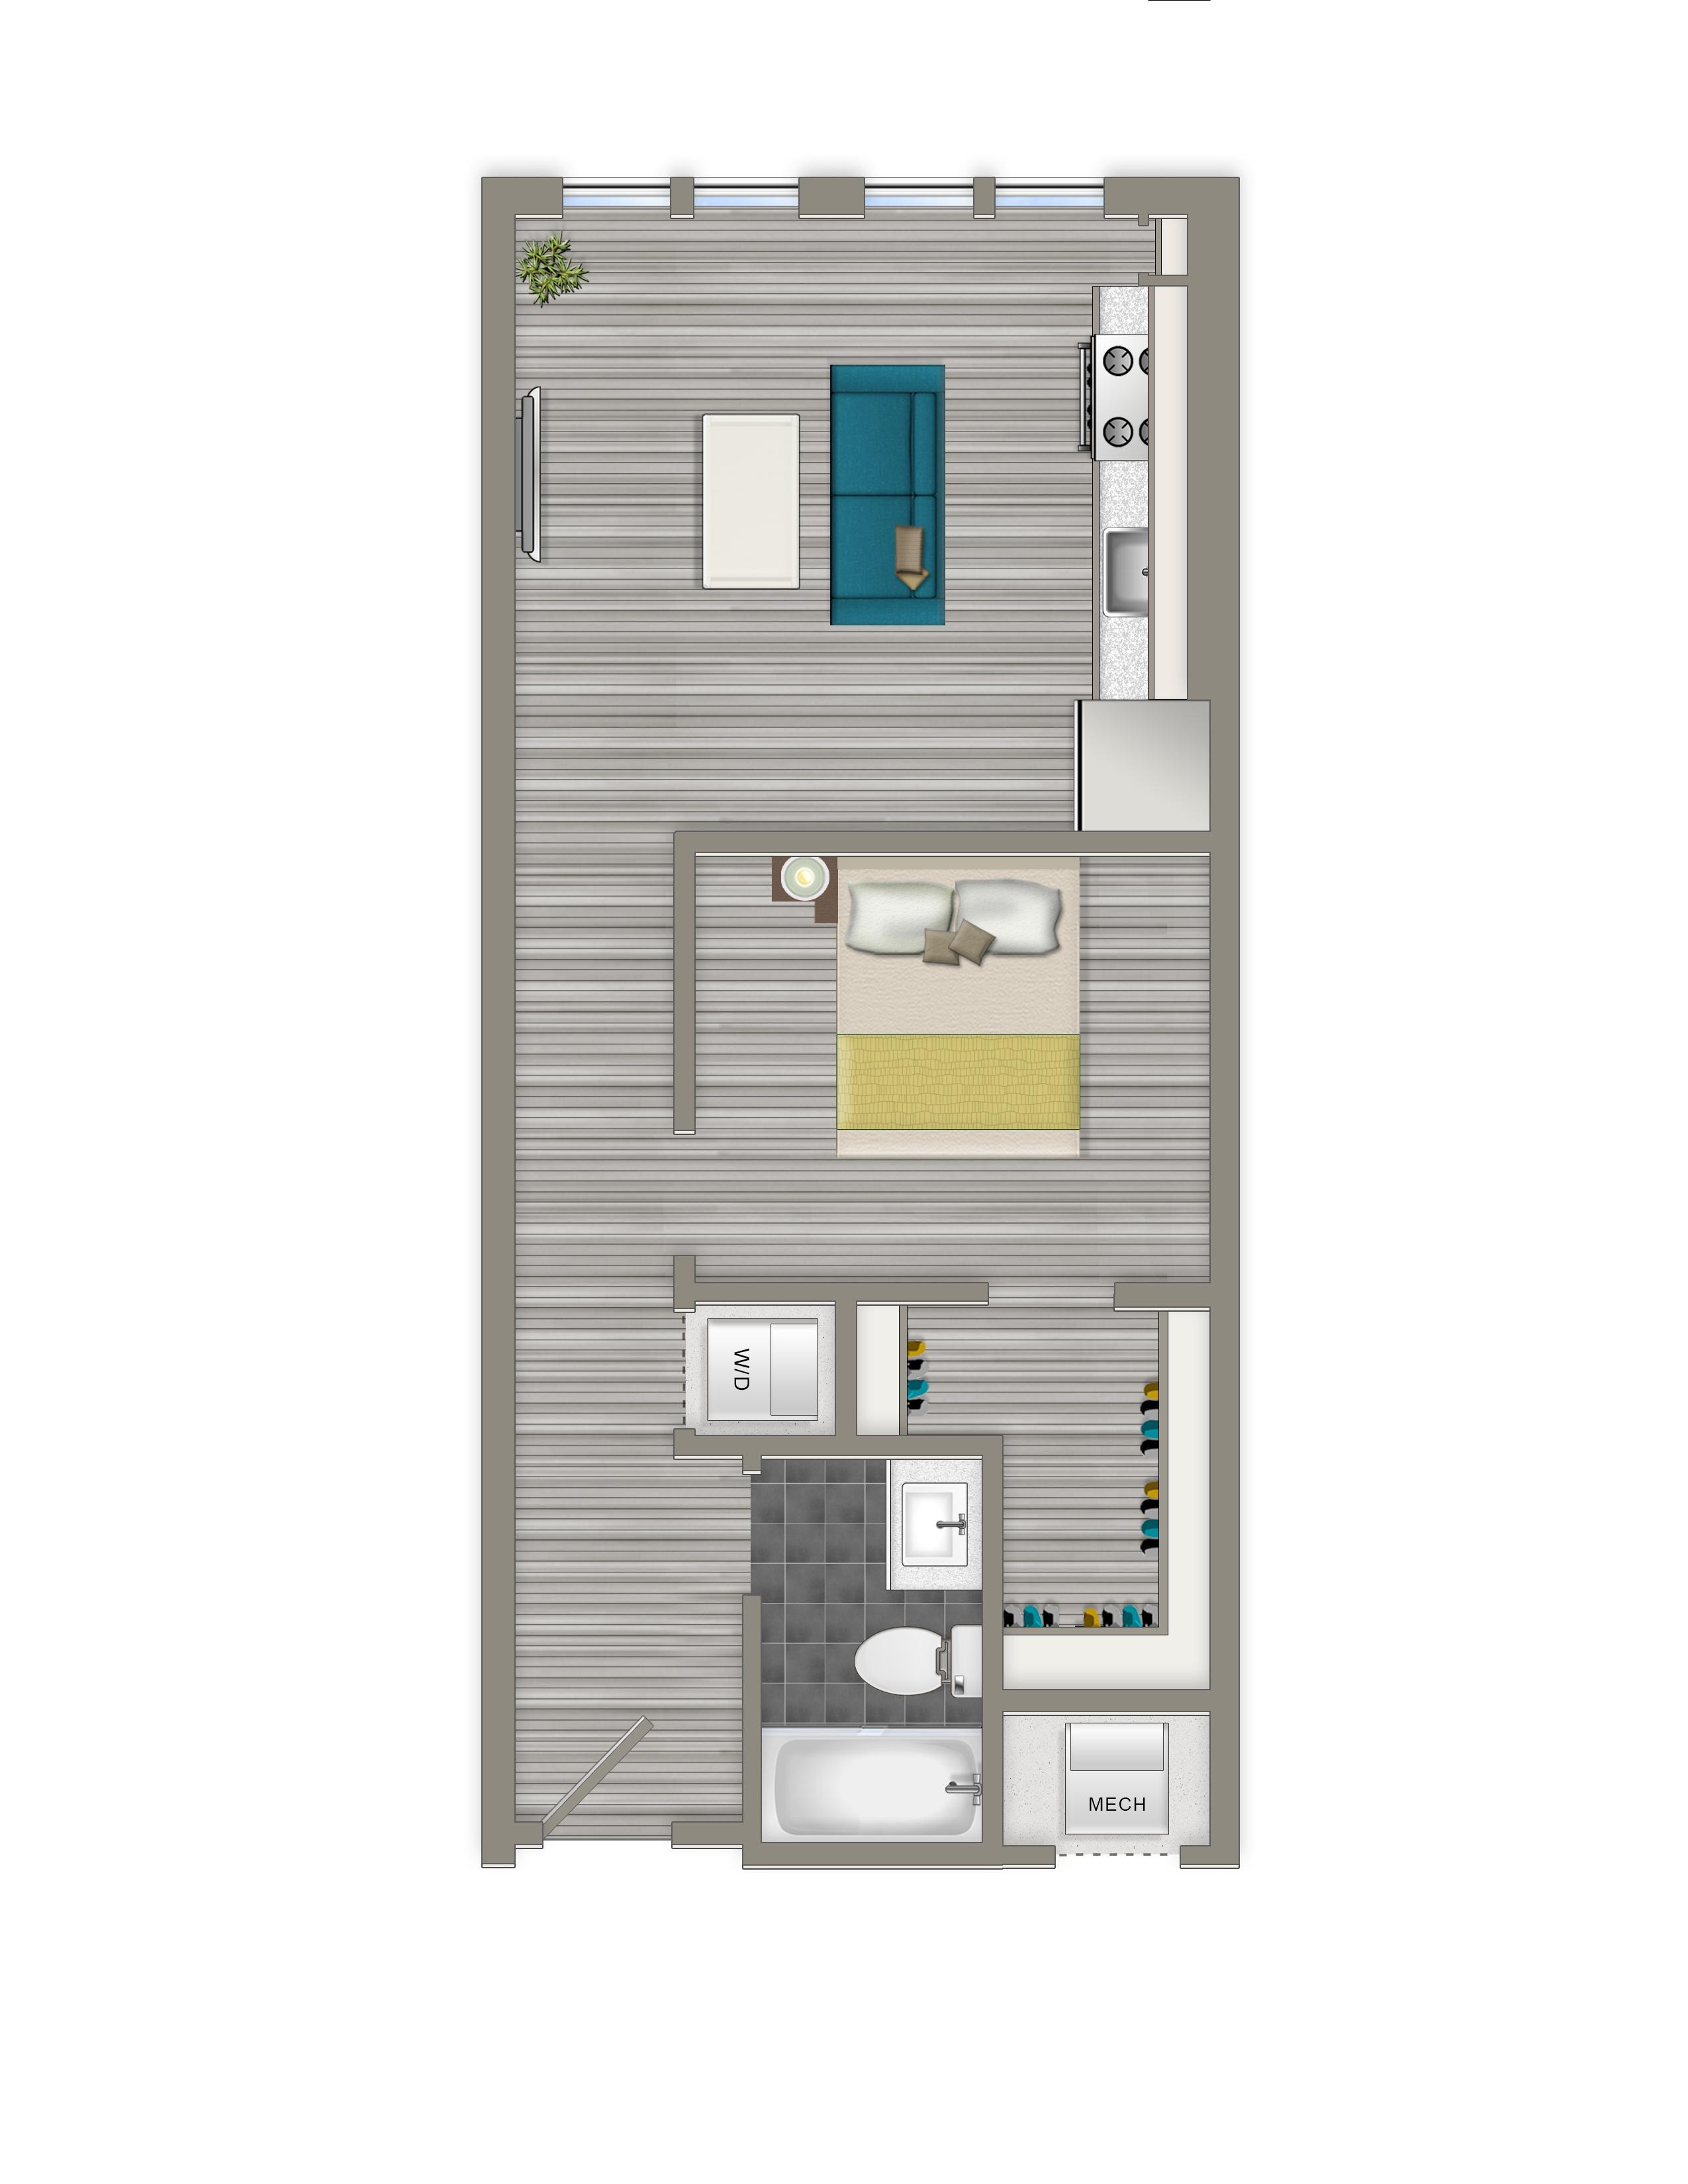 1-B - Crest Apartments